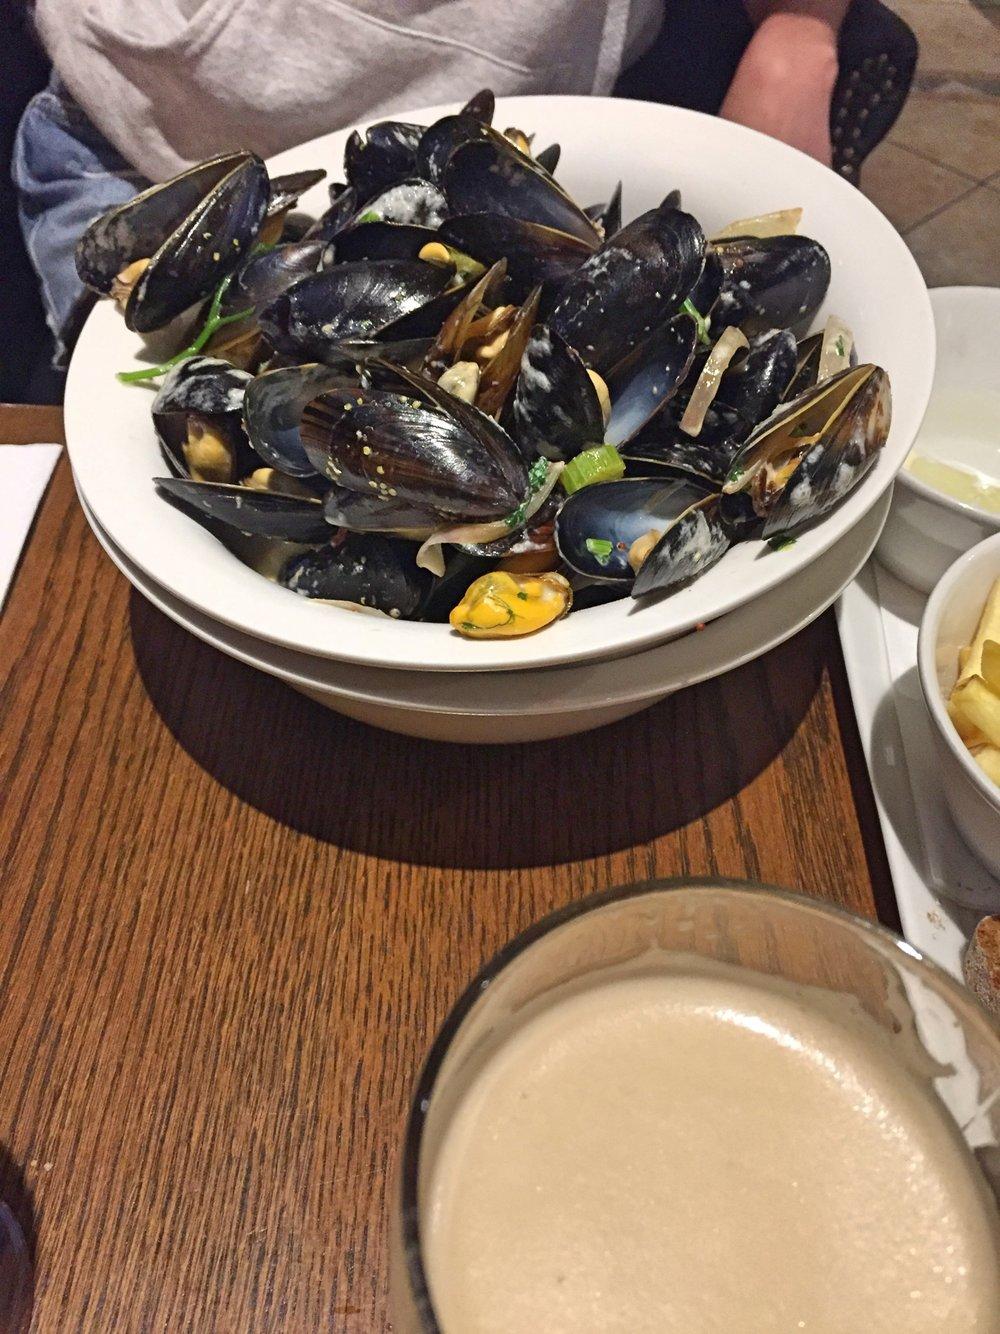 fullerton_arms_pub_guesthouse_menu_ballintoy_northern_ireland_niexplorer_ni_explorer (5).jpg